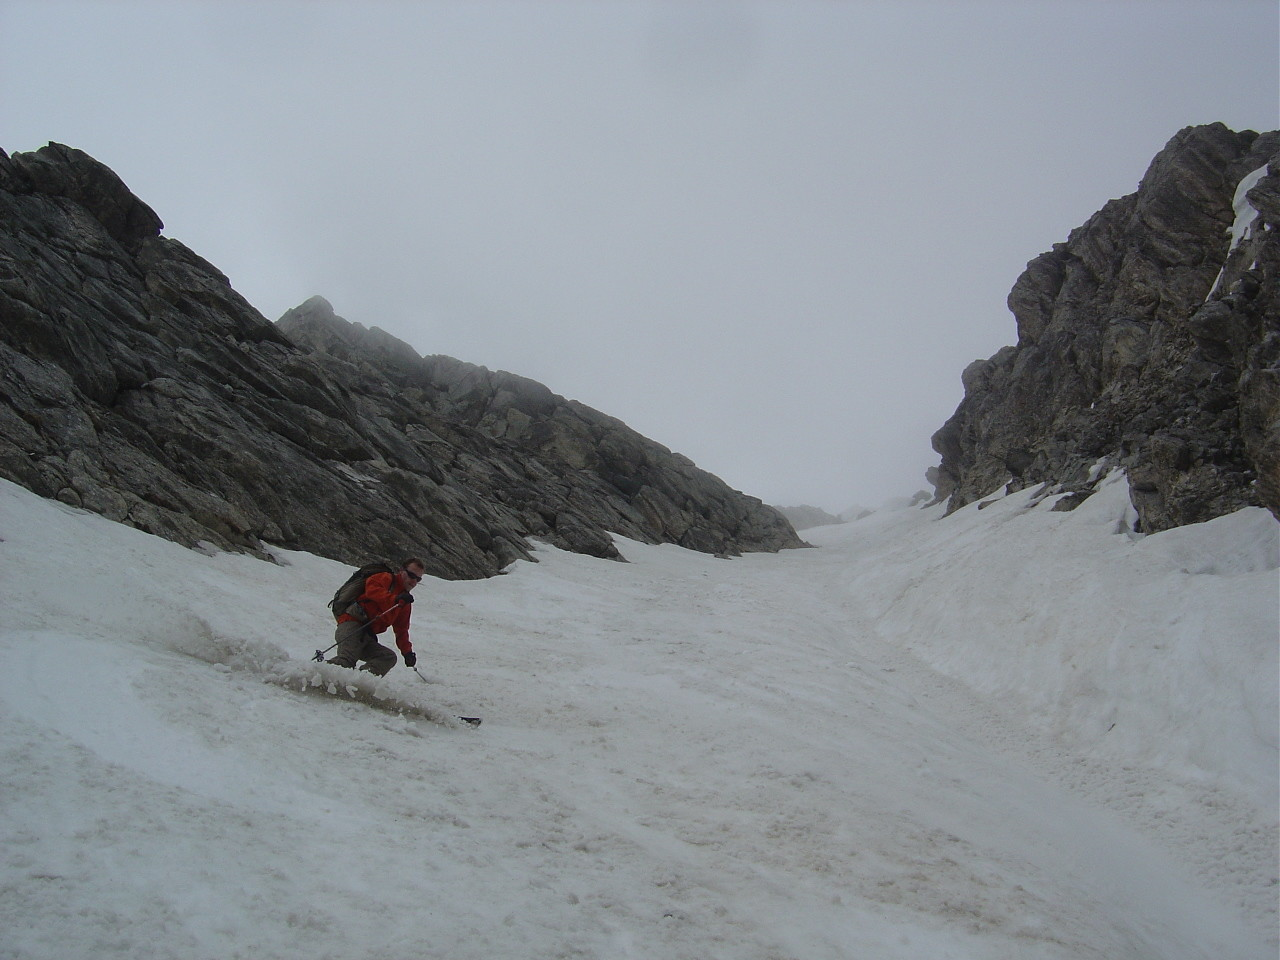 Très bon ski en bordure